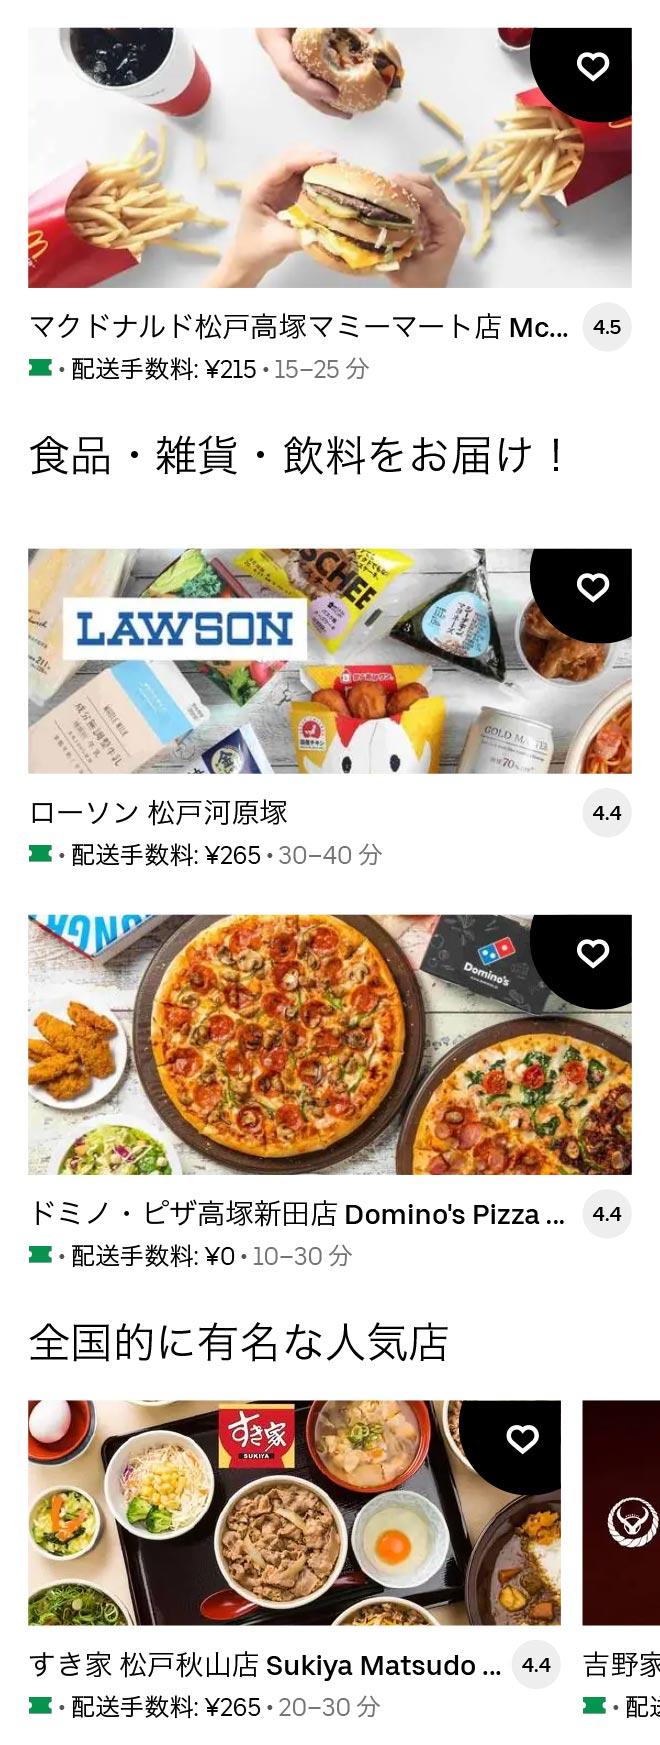 U ichikawa oono 2105 01